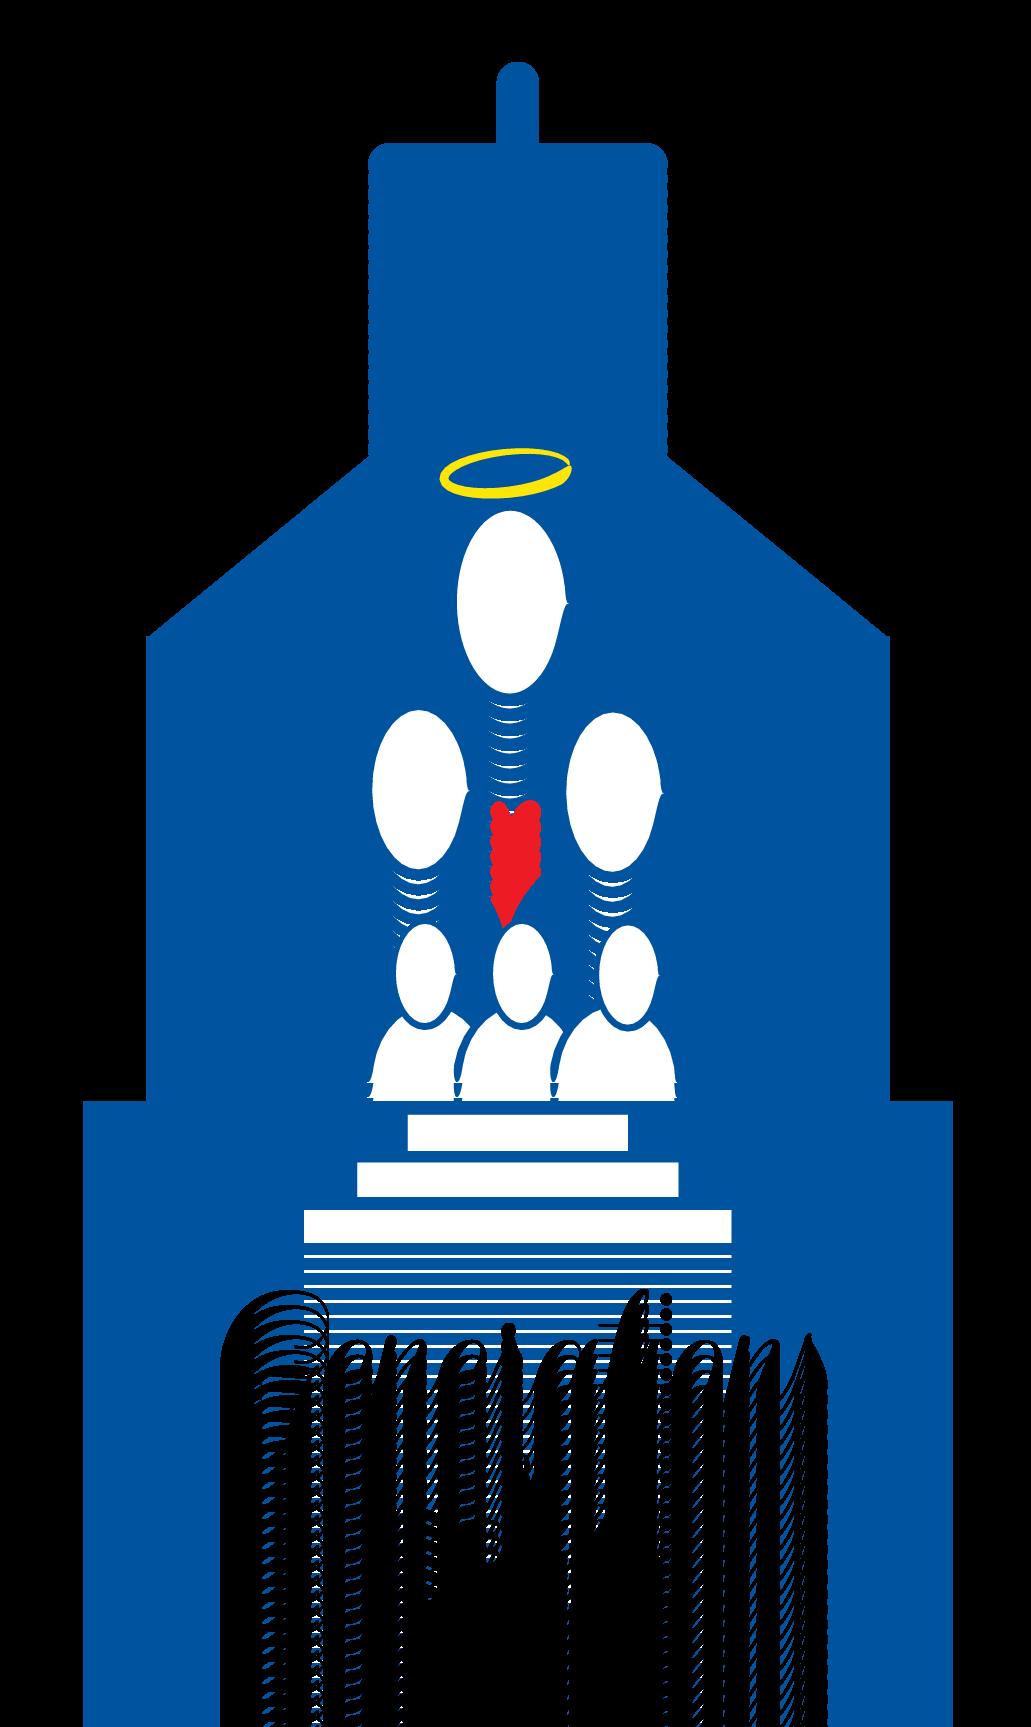 Community clipart parishioner. Adult ministry saint joseph